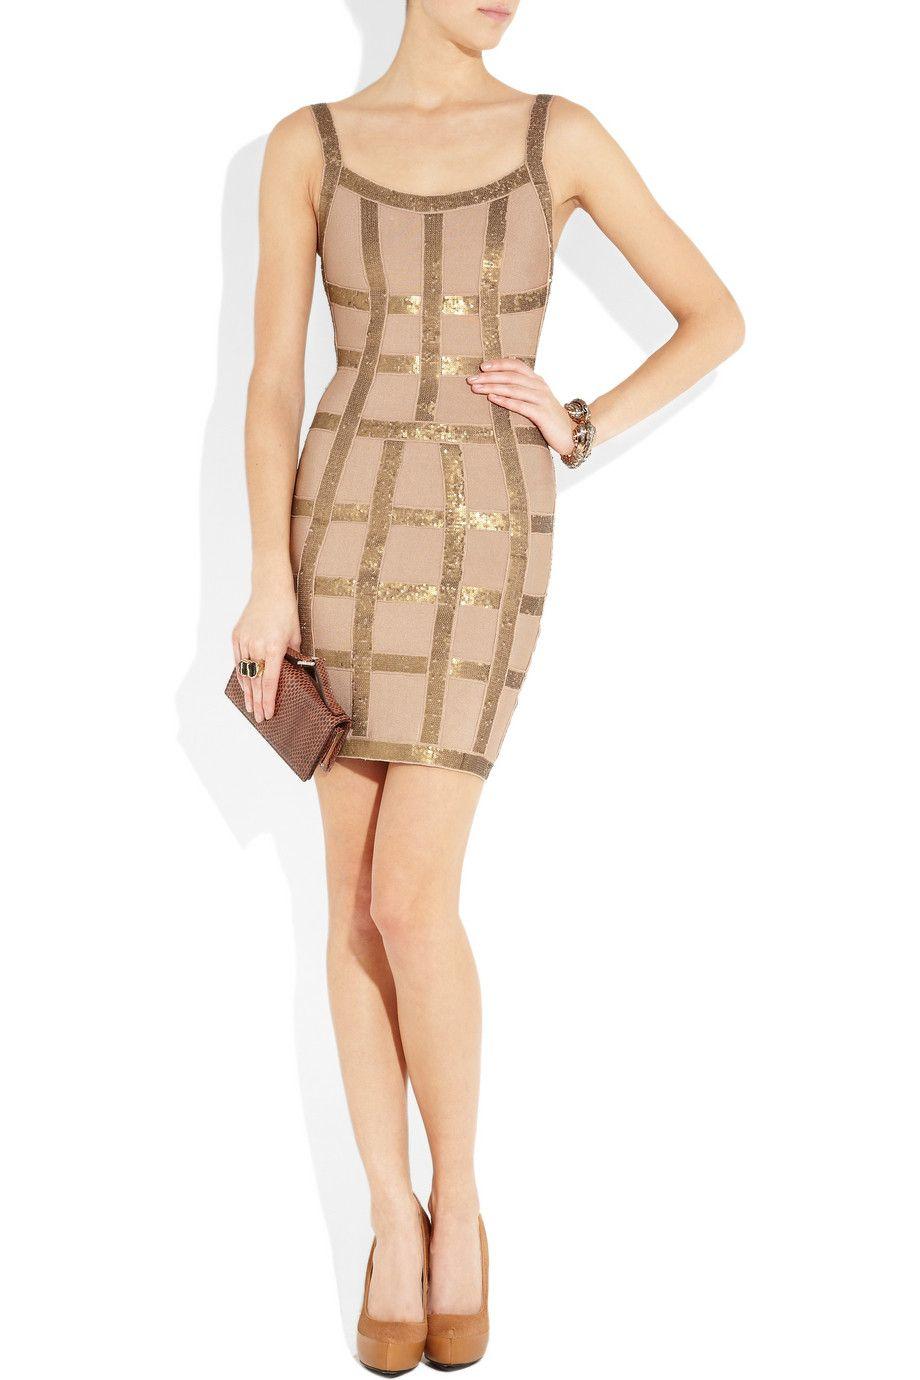 Herve leger sequined bandage dress if i had a million dollars i